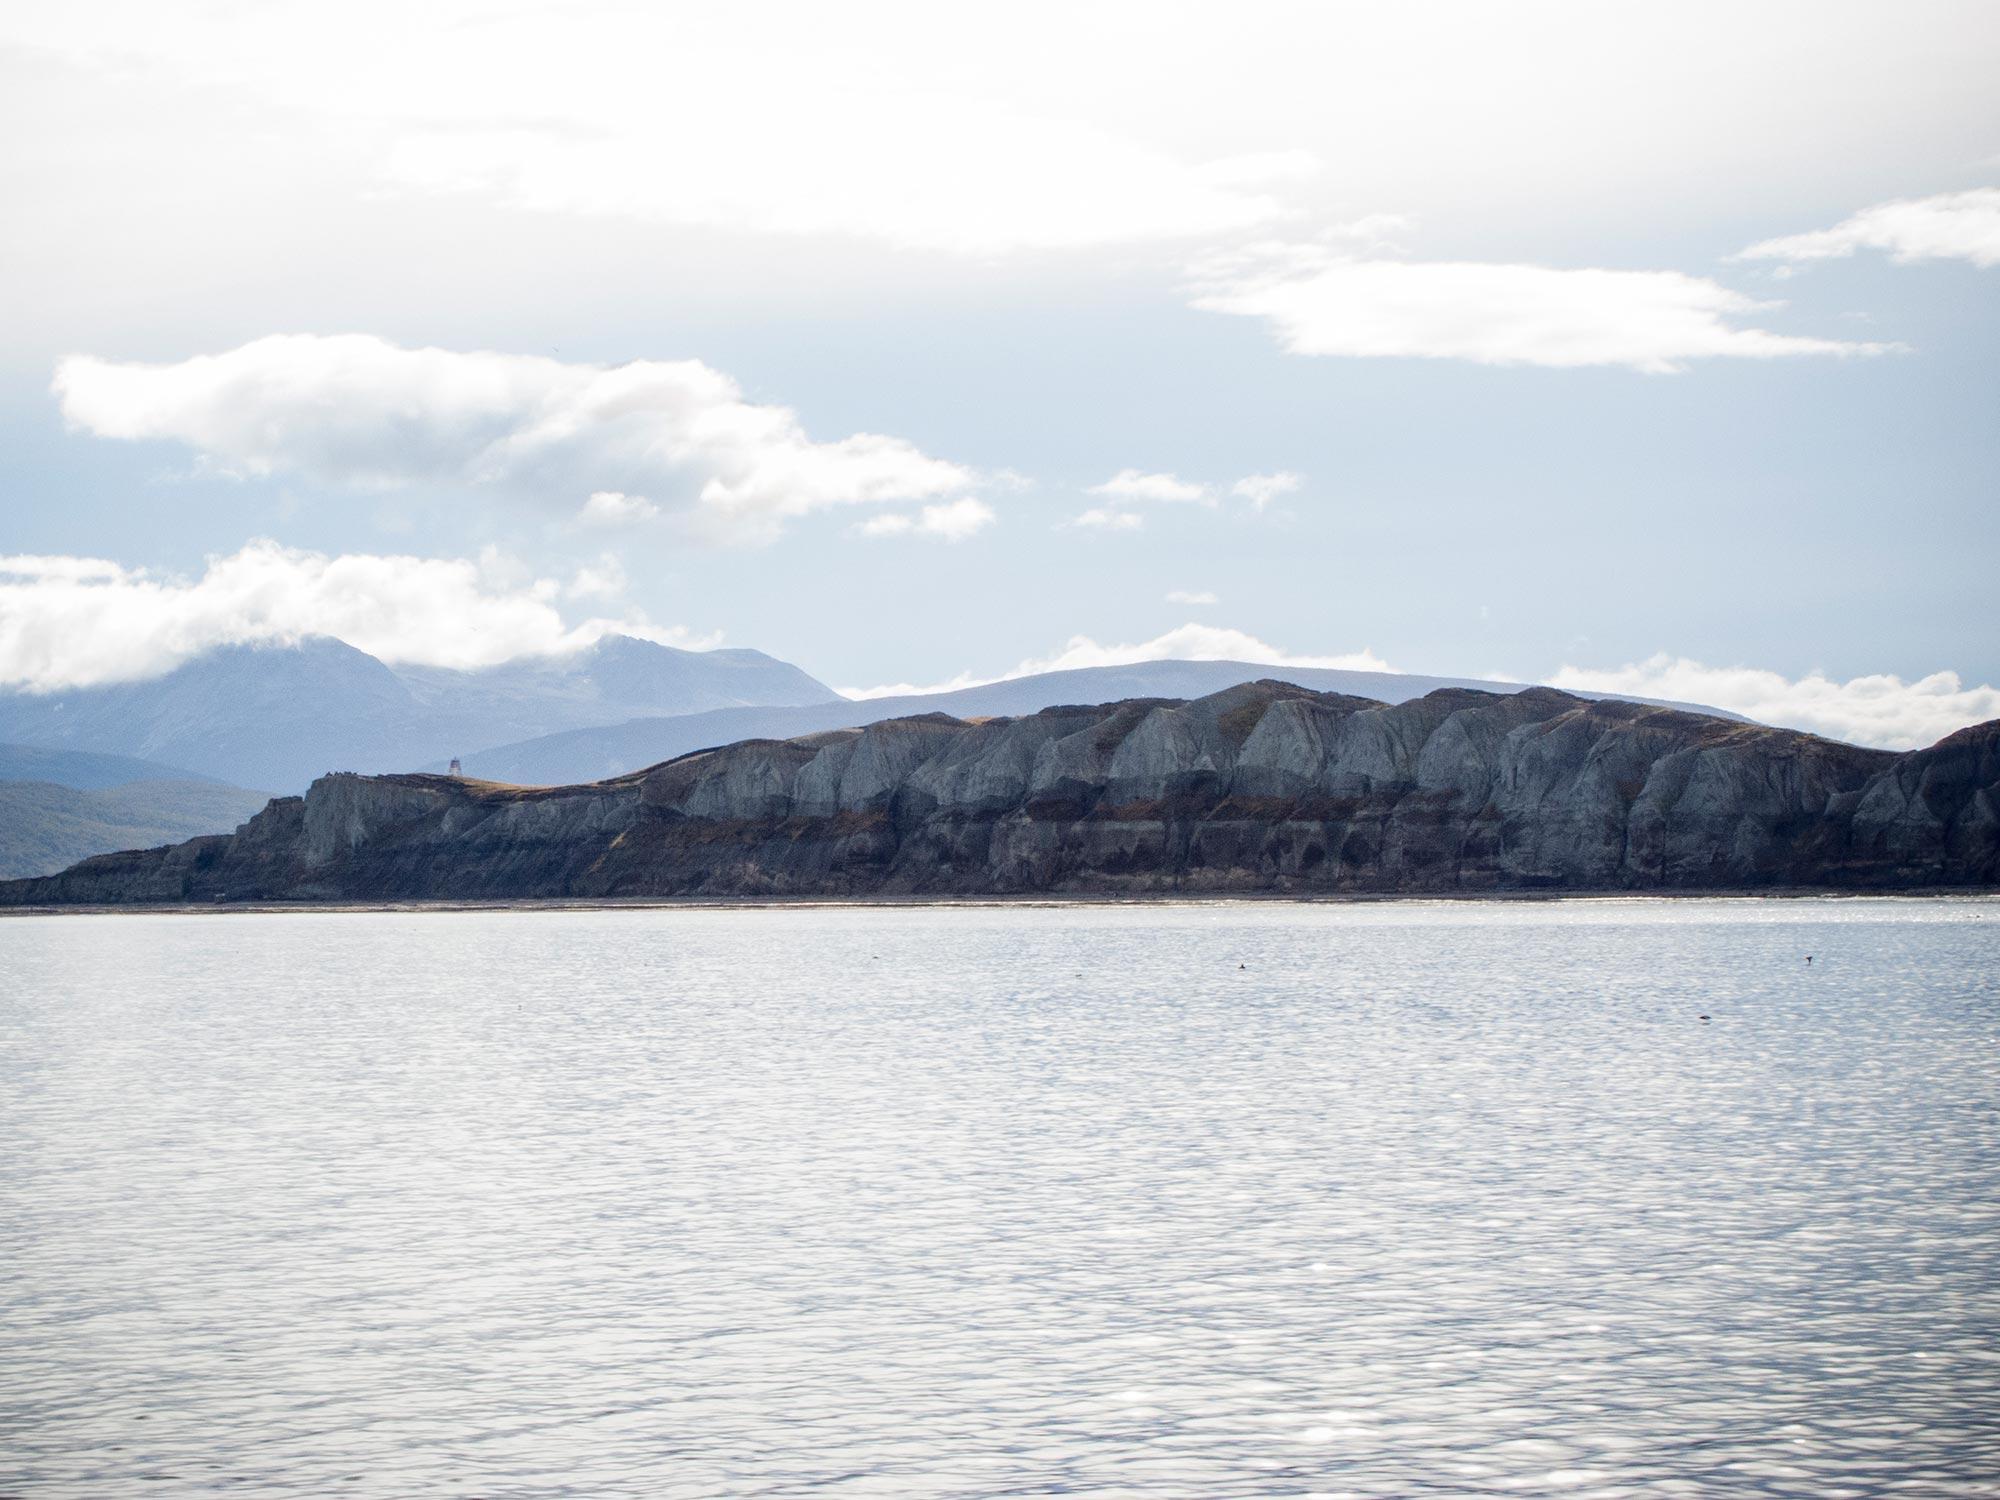 Argentina Ushuaia beagle channel cliffs